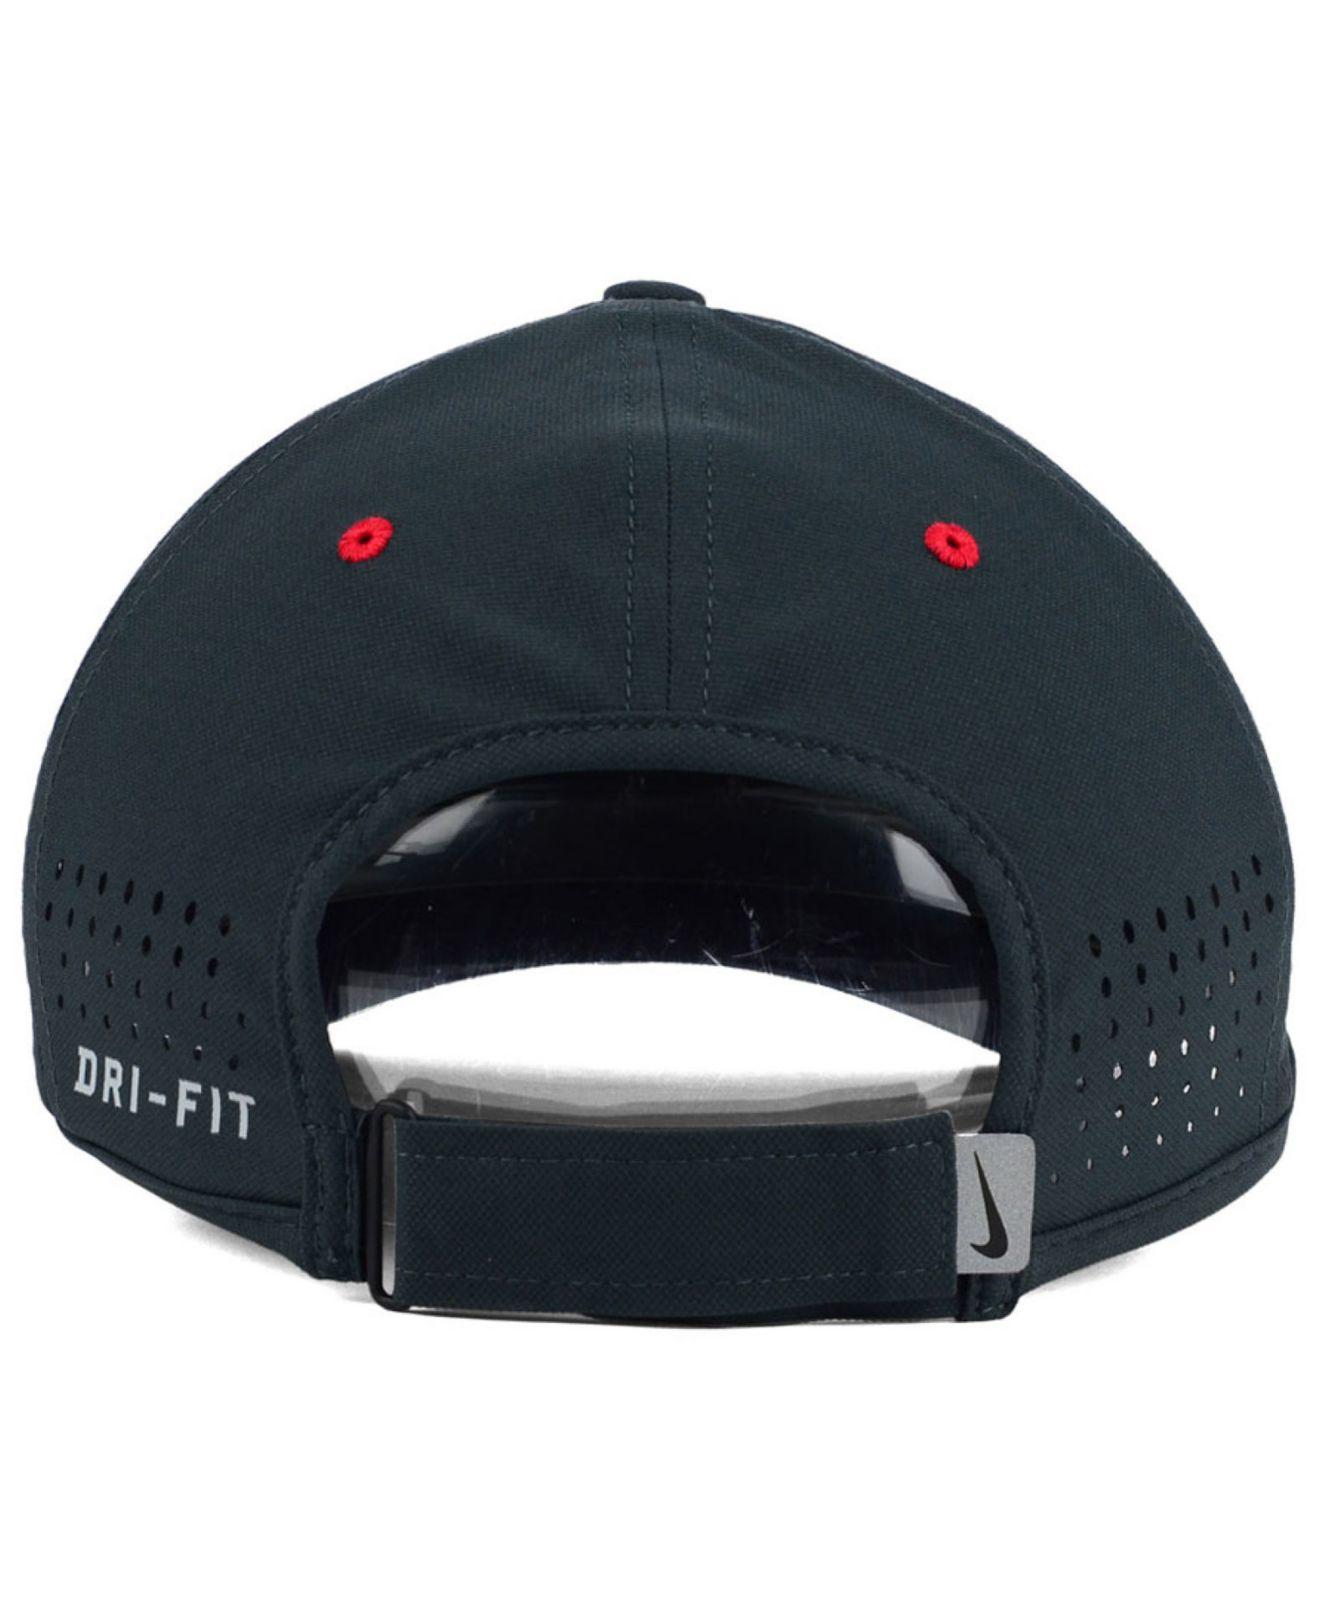 5b0d87d0252 ... greece lyst nike boston red sox vapor swoosh adjustable cap in gray for  men 5df6f 1b6be ...